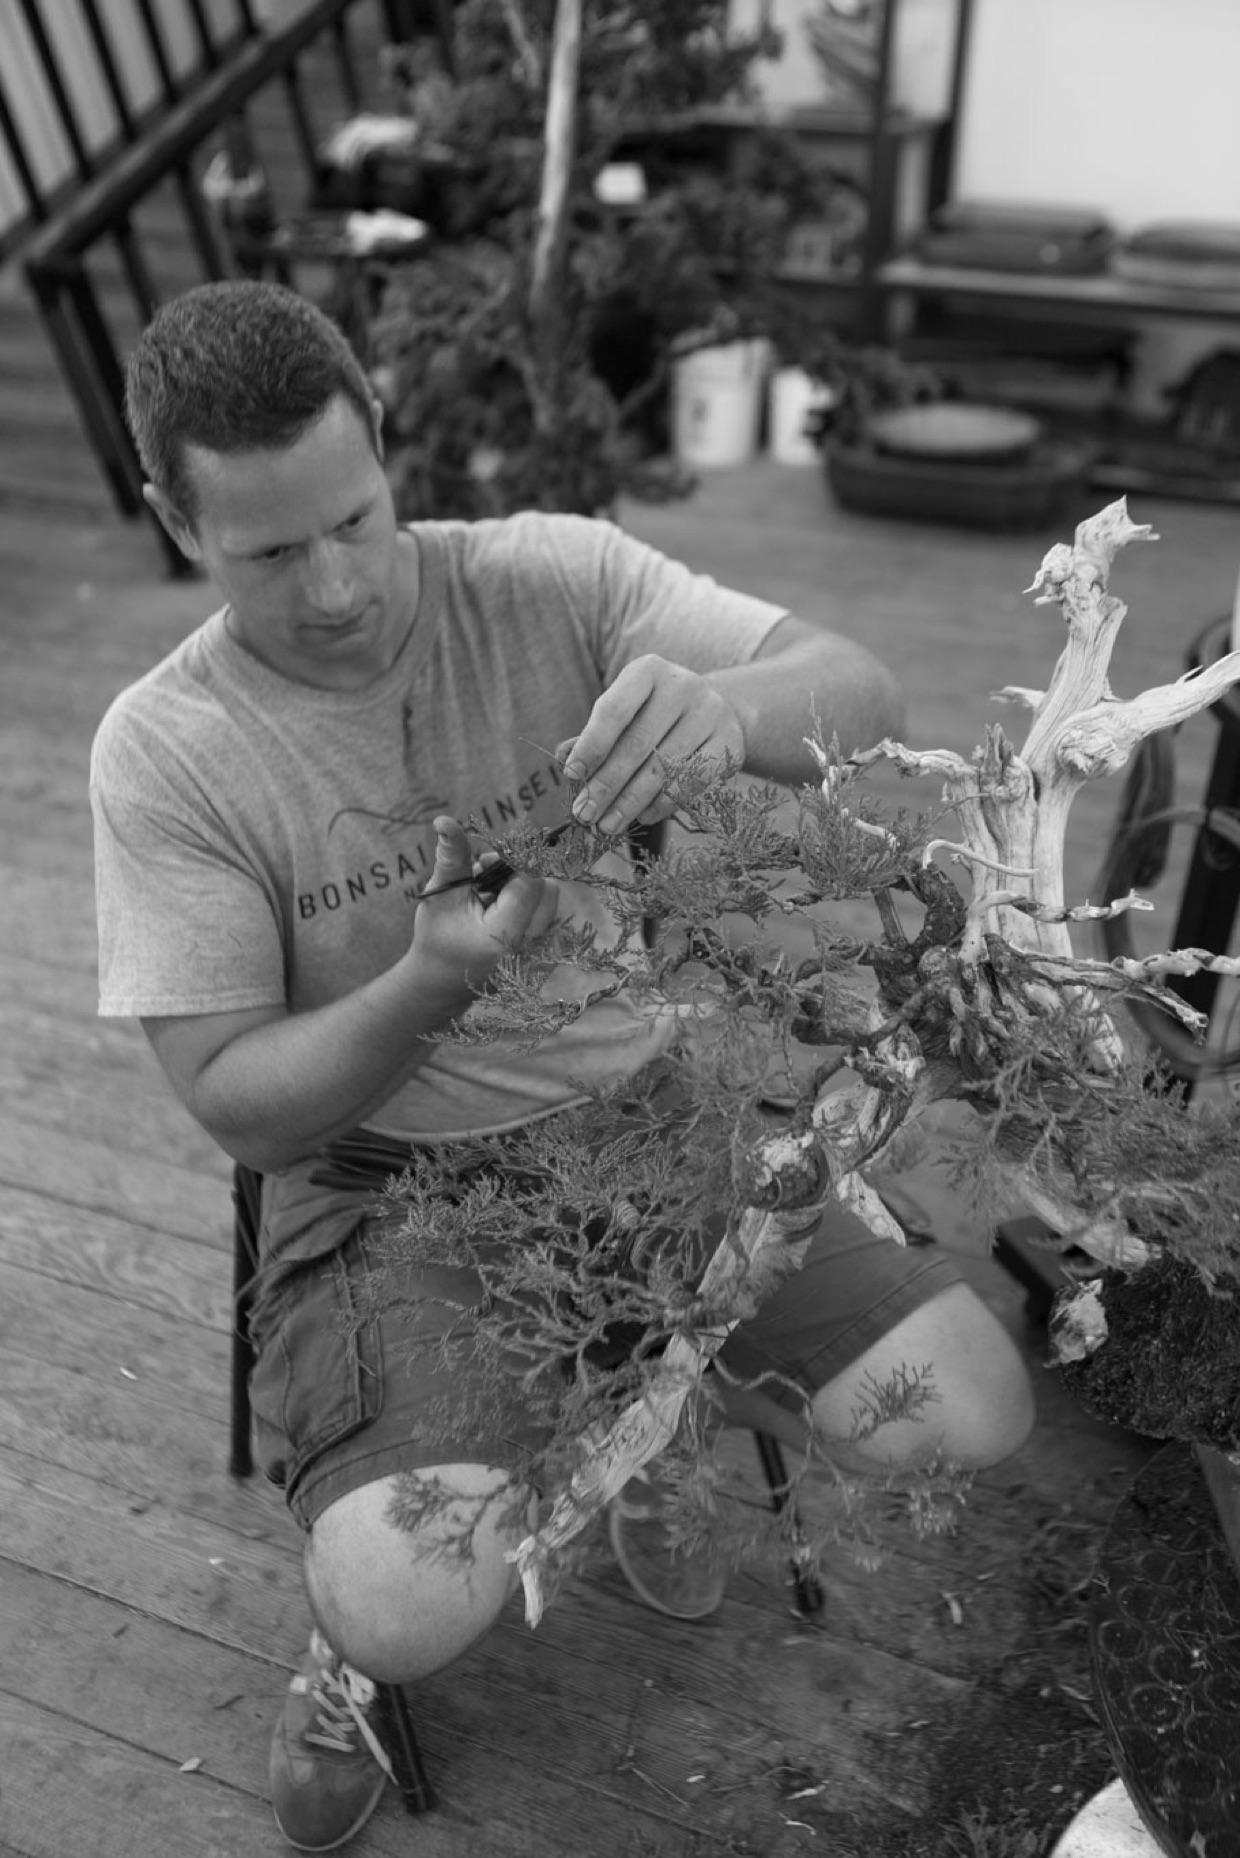 ryan_neil_wiring_bonsai_mirai